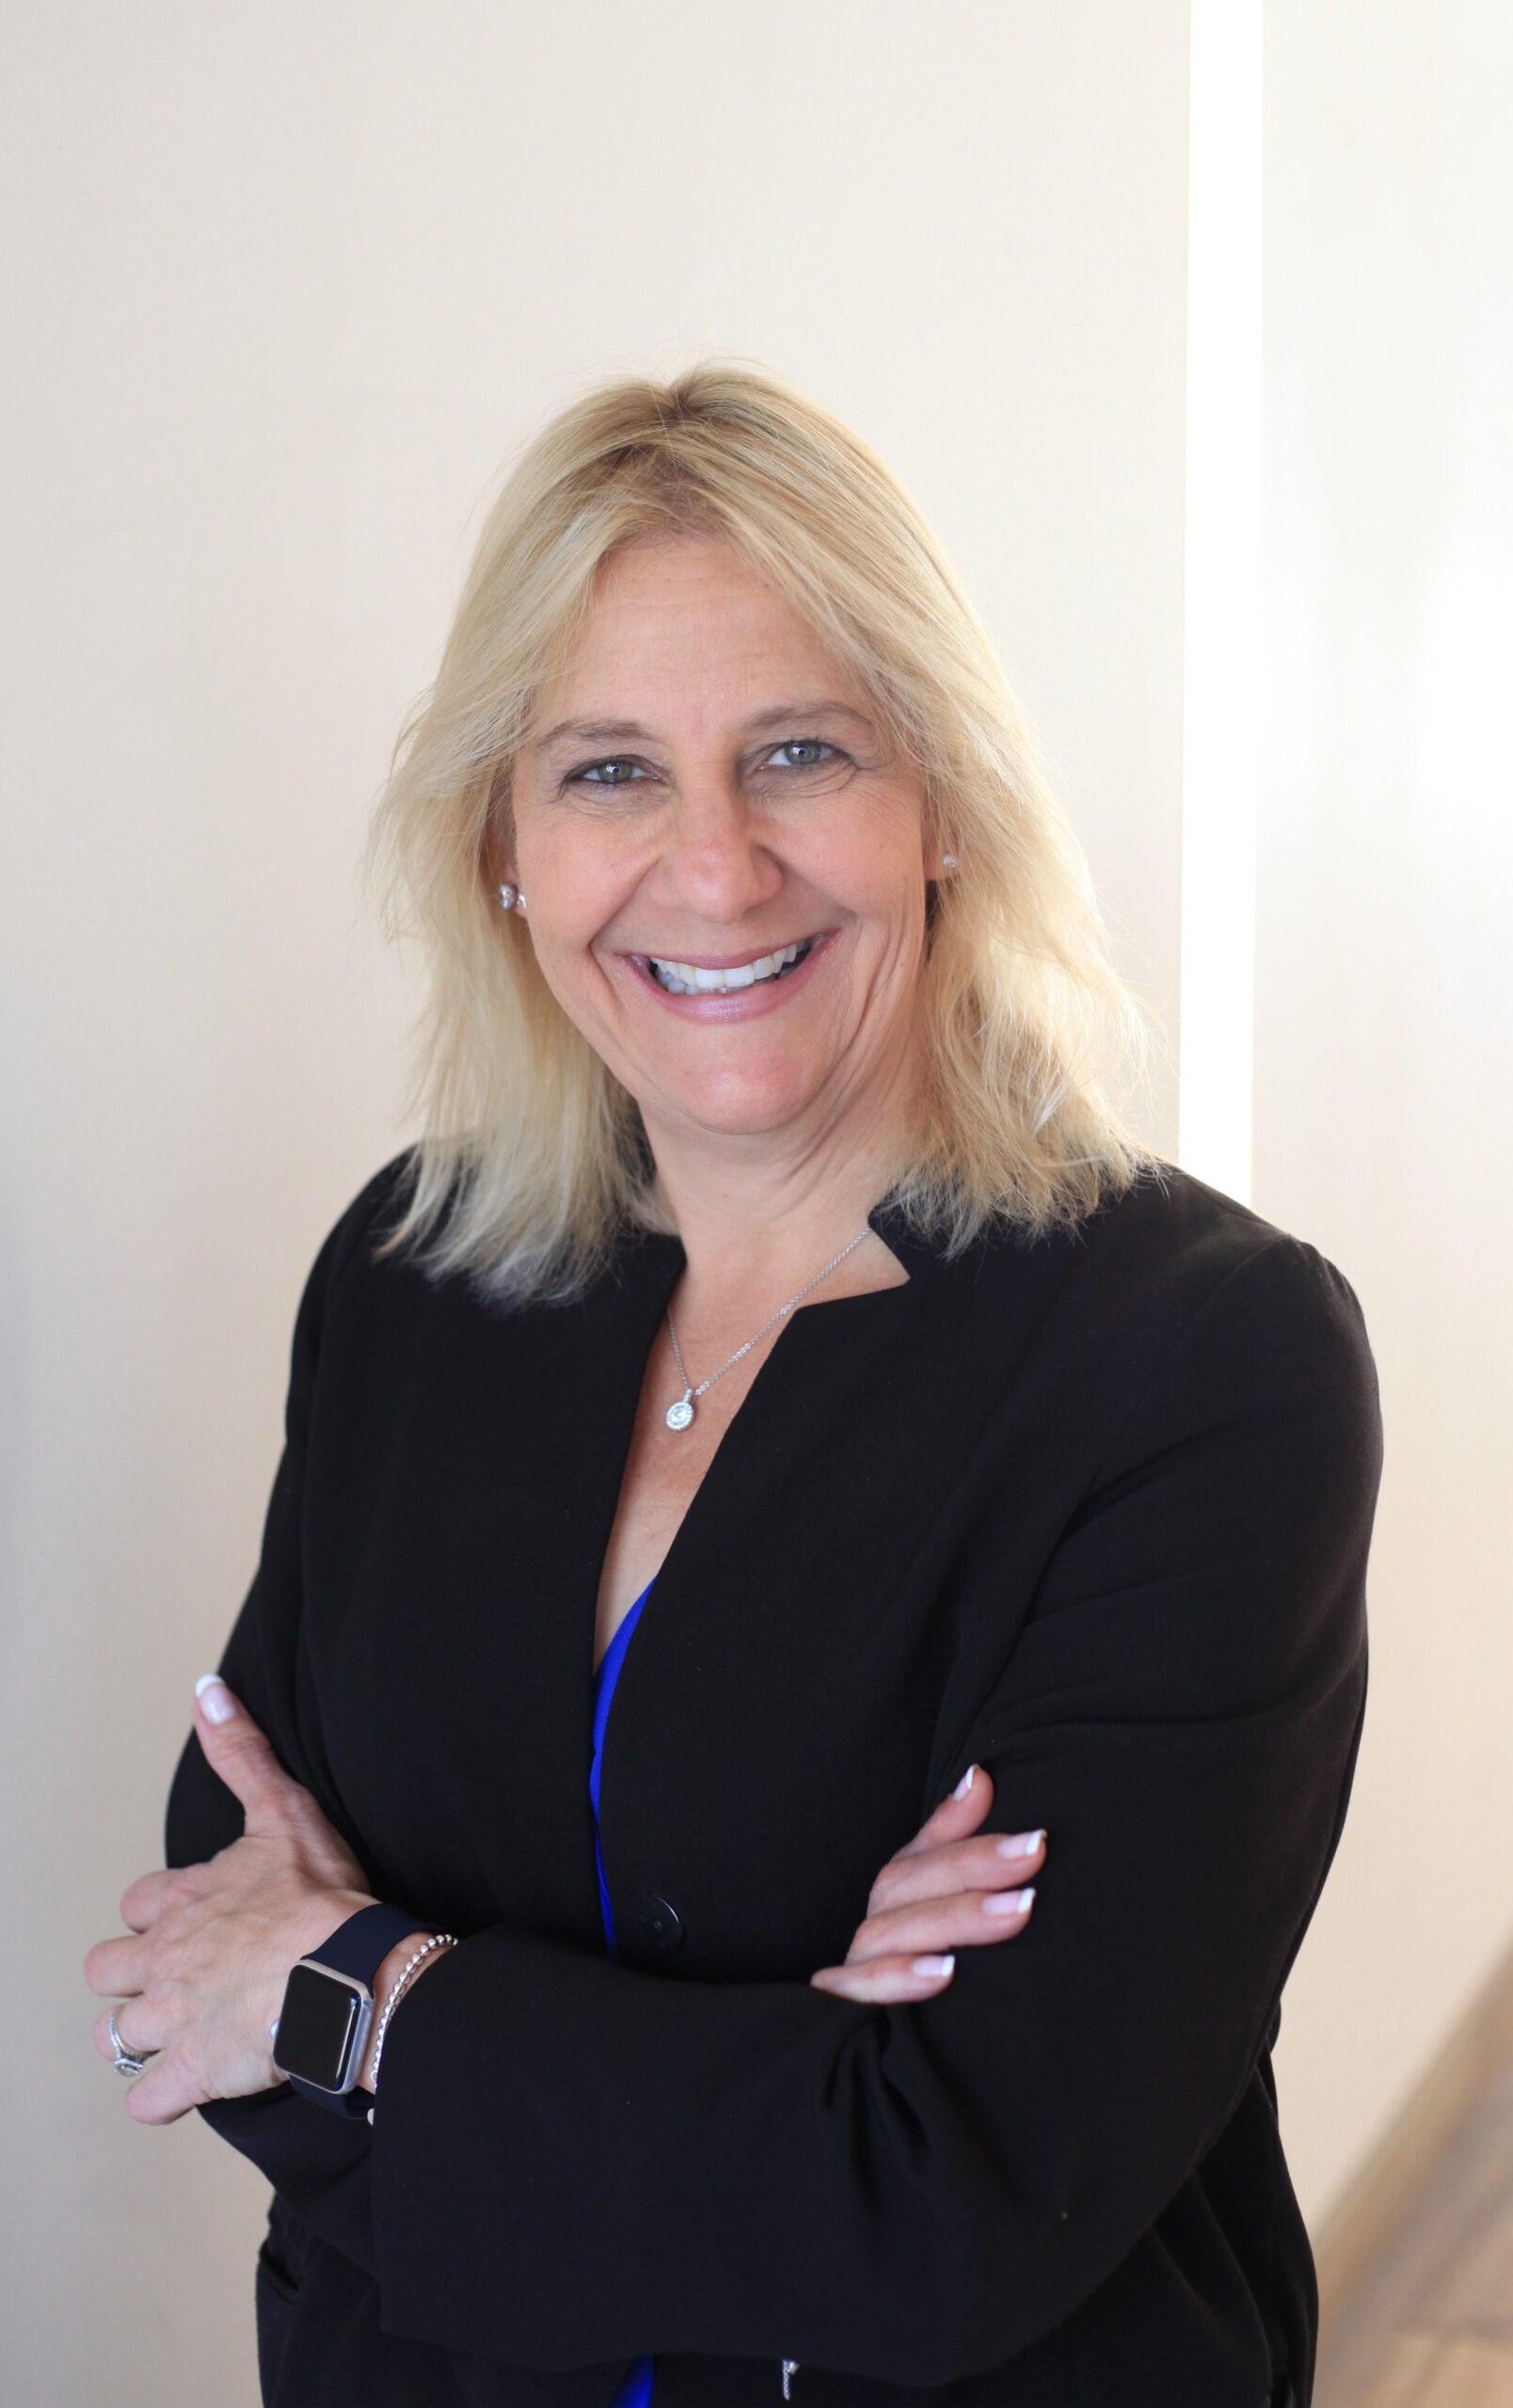 Janice Miller headshot